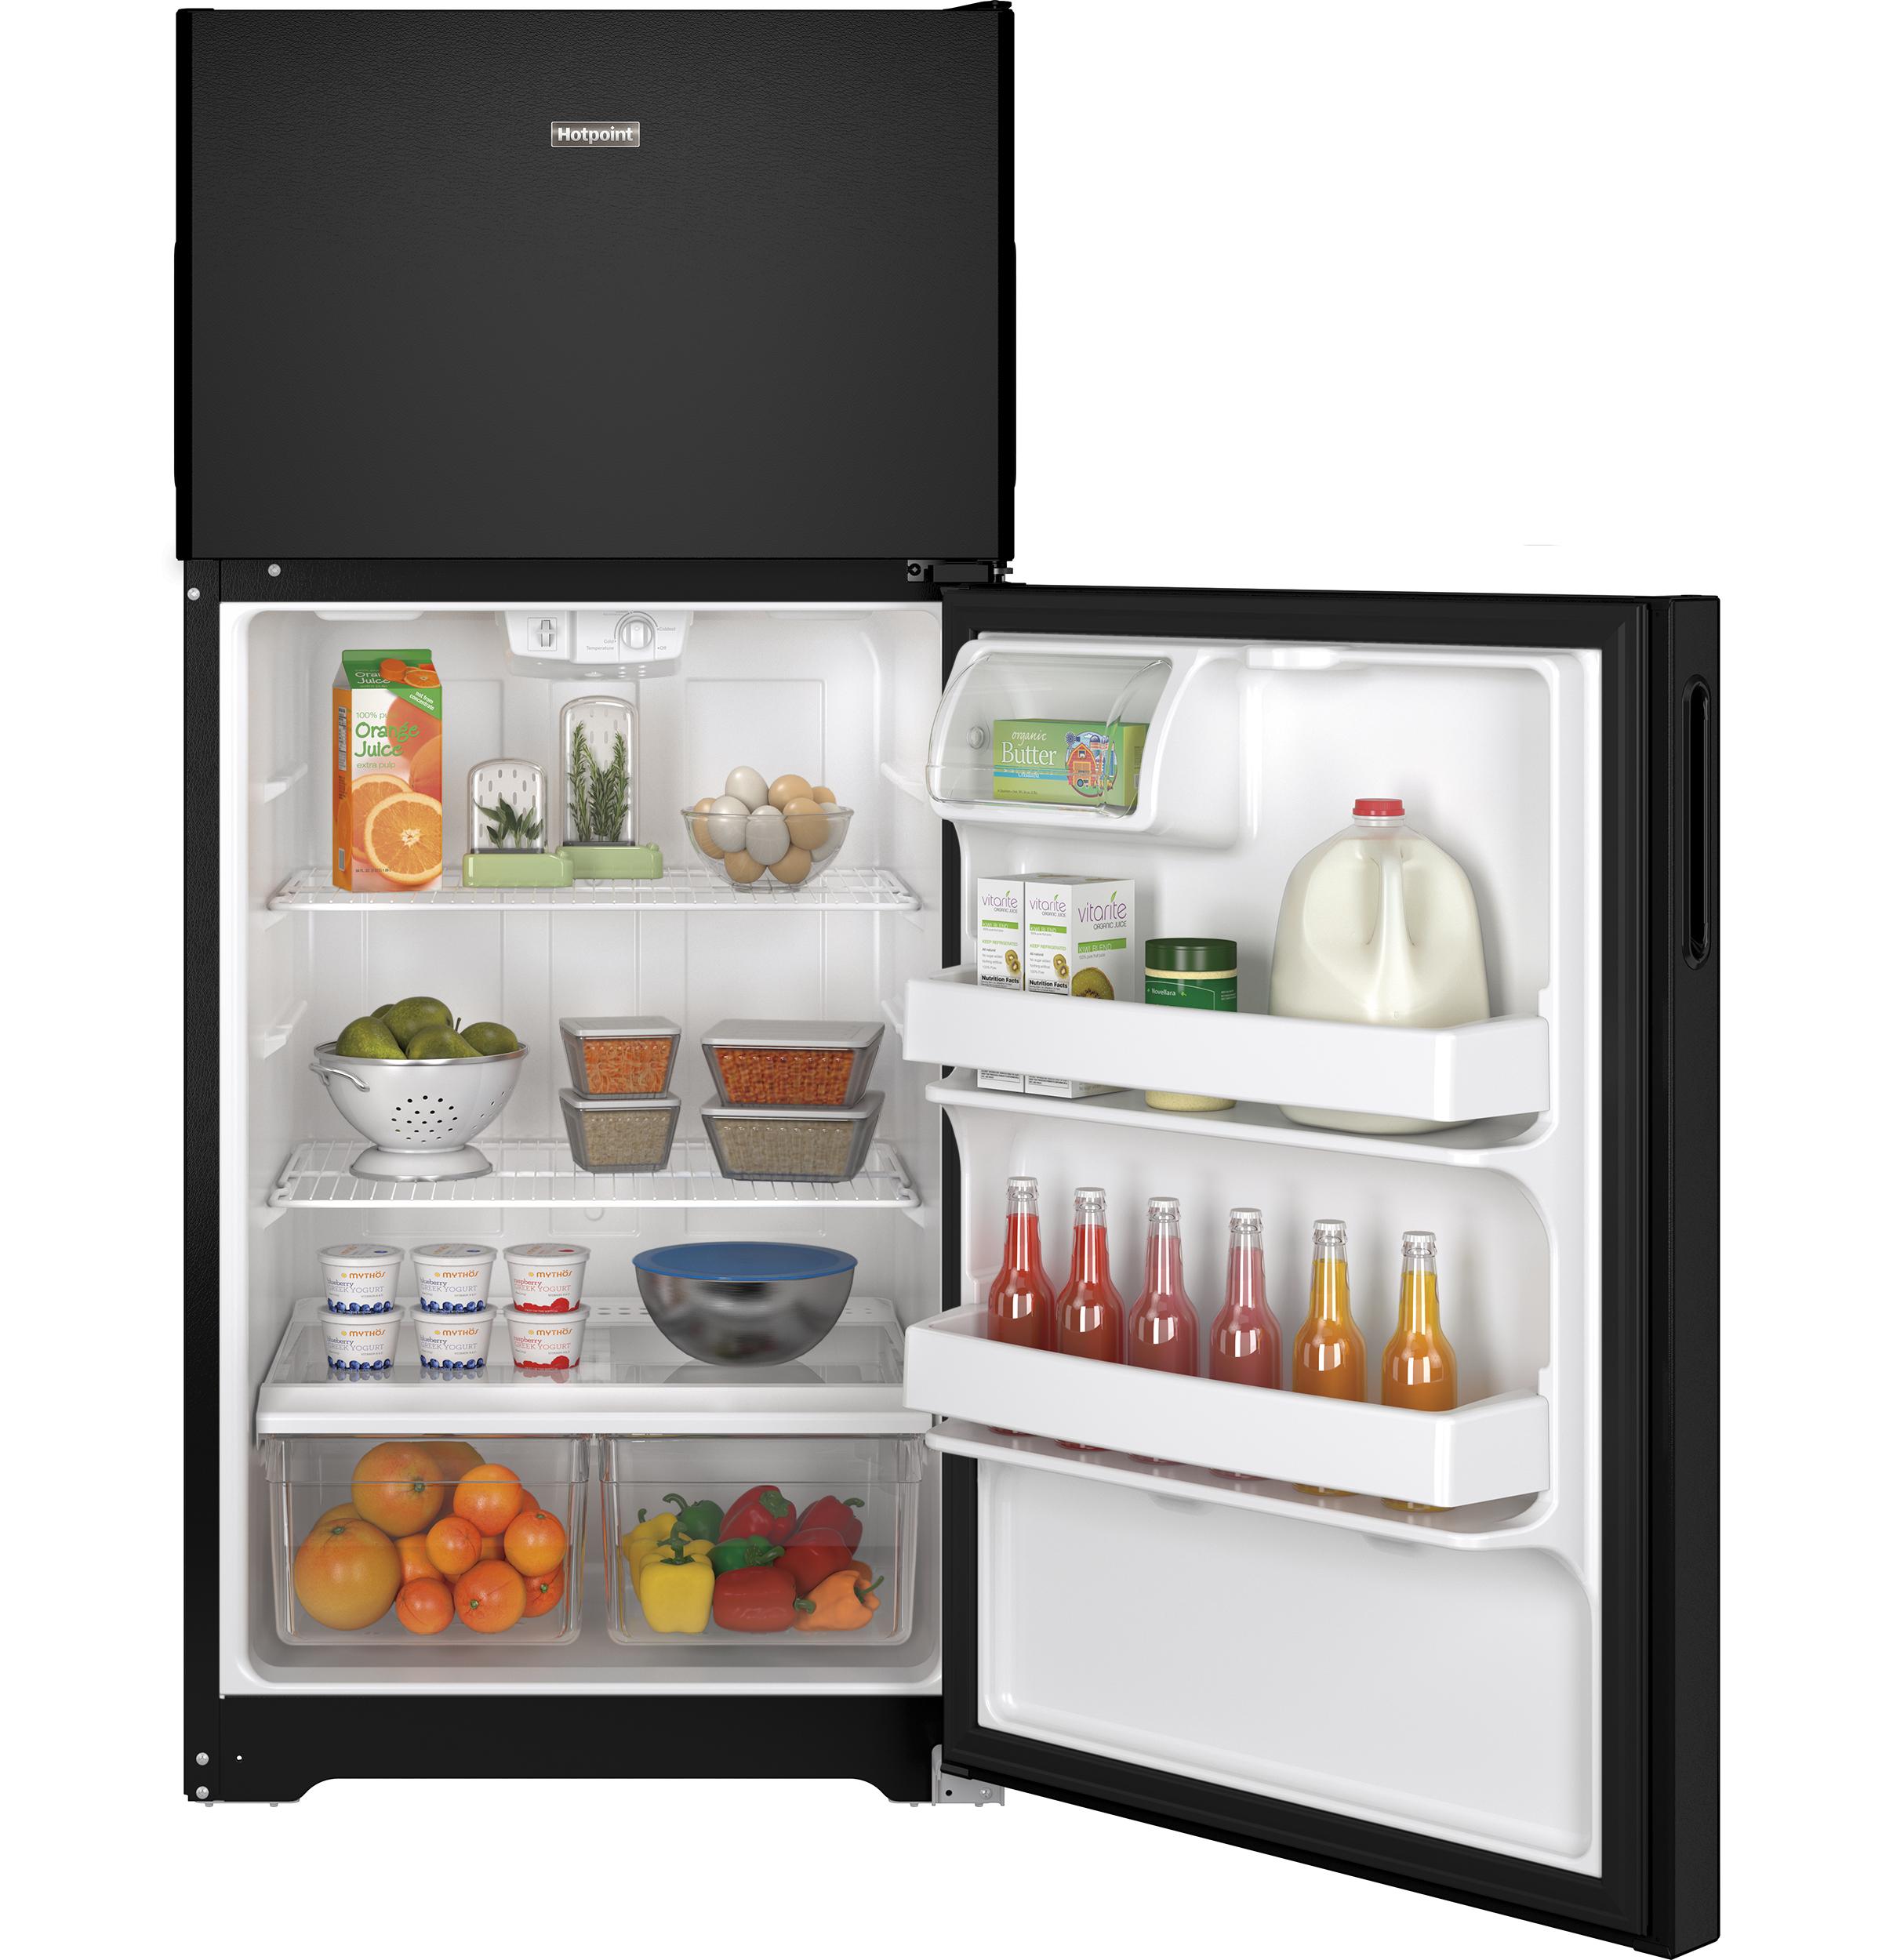 Model: HPS15BTHRBB | Hotpoint Hotpoint® 14.6 Cu. Ft. Recessed Handle Top-Freezer Refrigerator